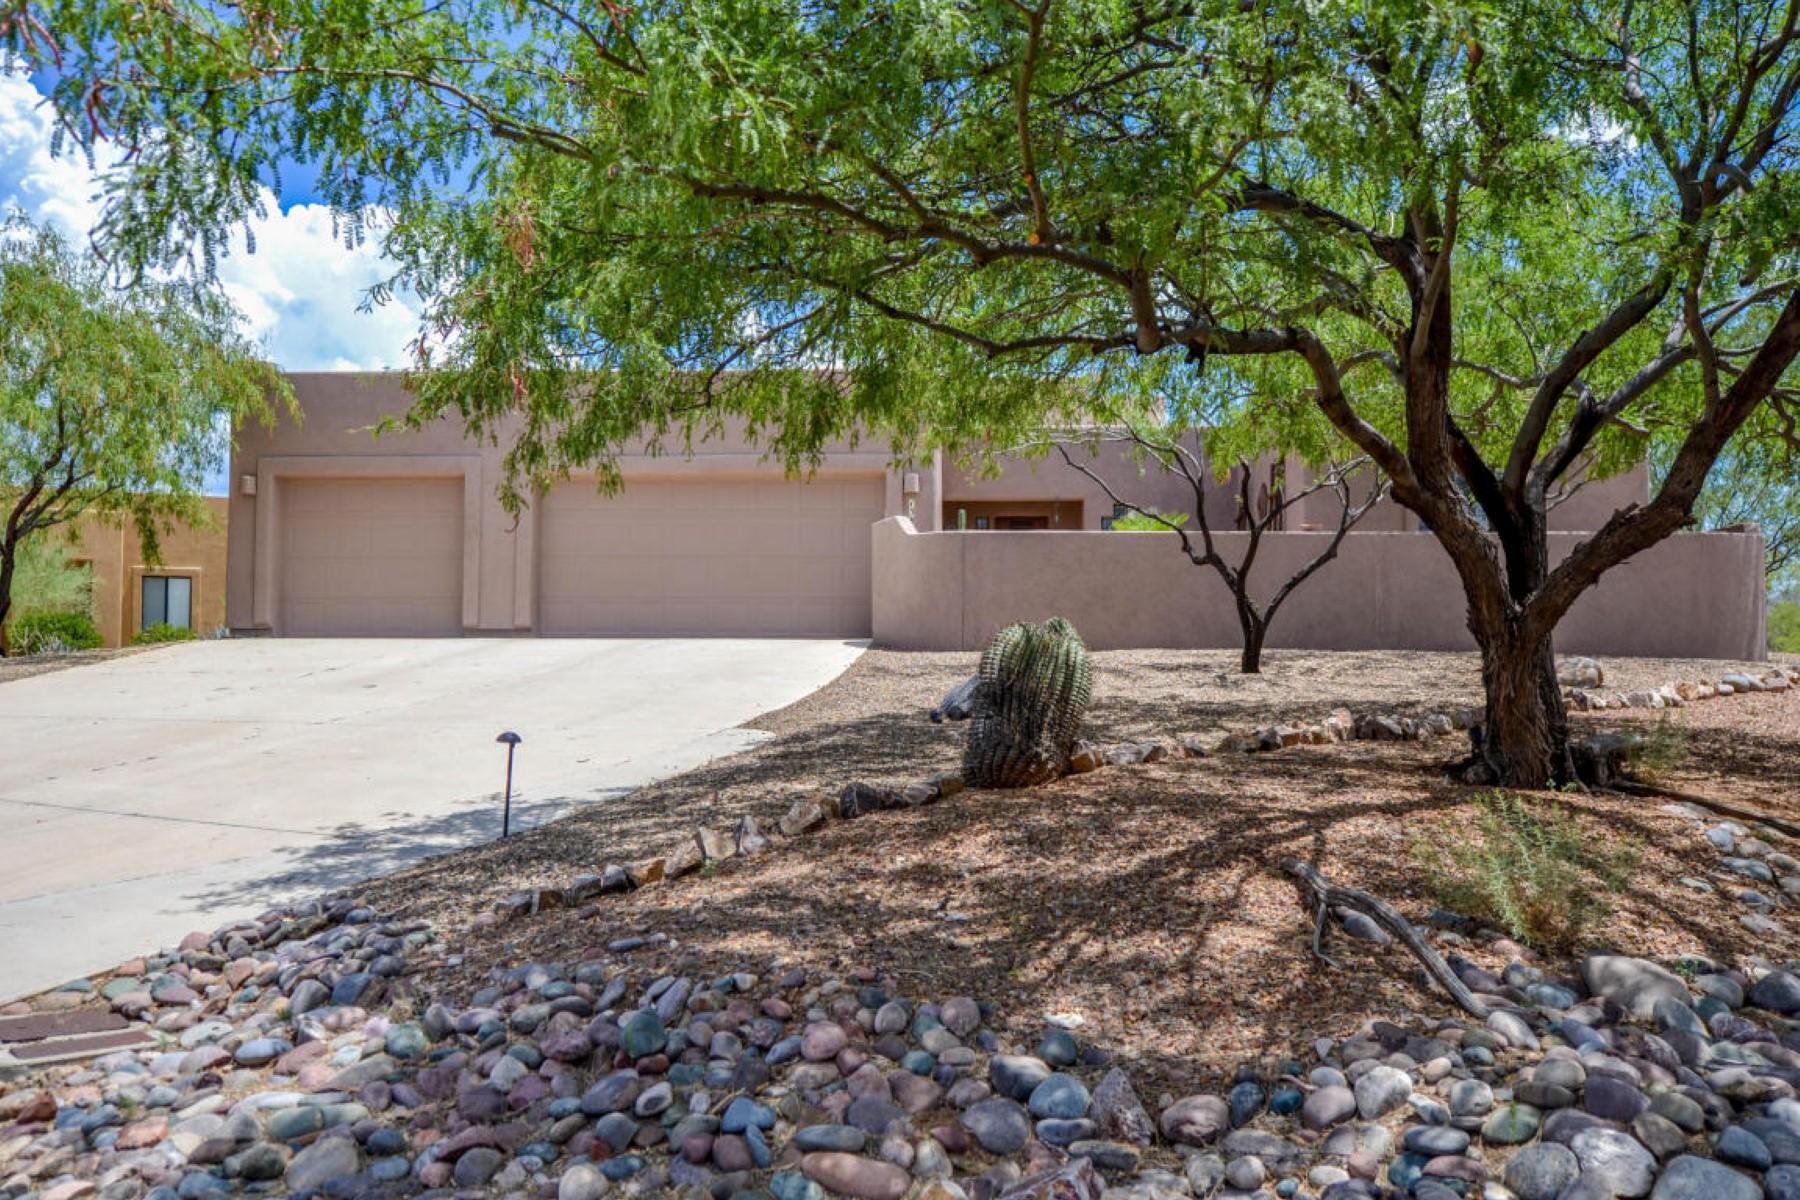 Single Family Home for Sale at Semi-Custom Sombra built home on nearly one acre 13876 E Placita Asta Vail, Arizona 85641 United States